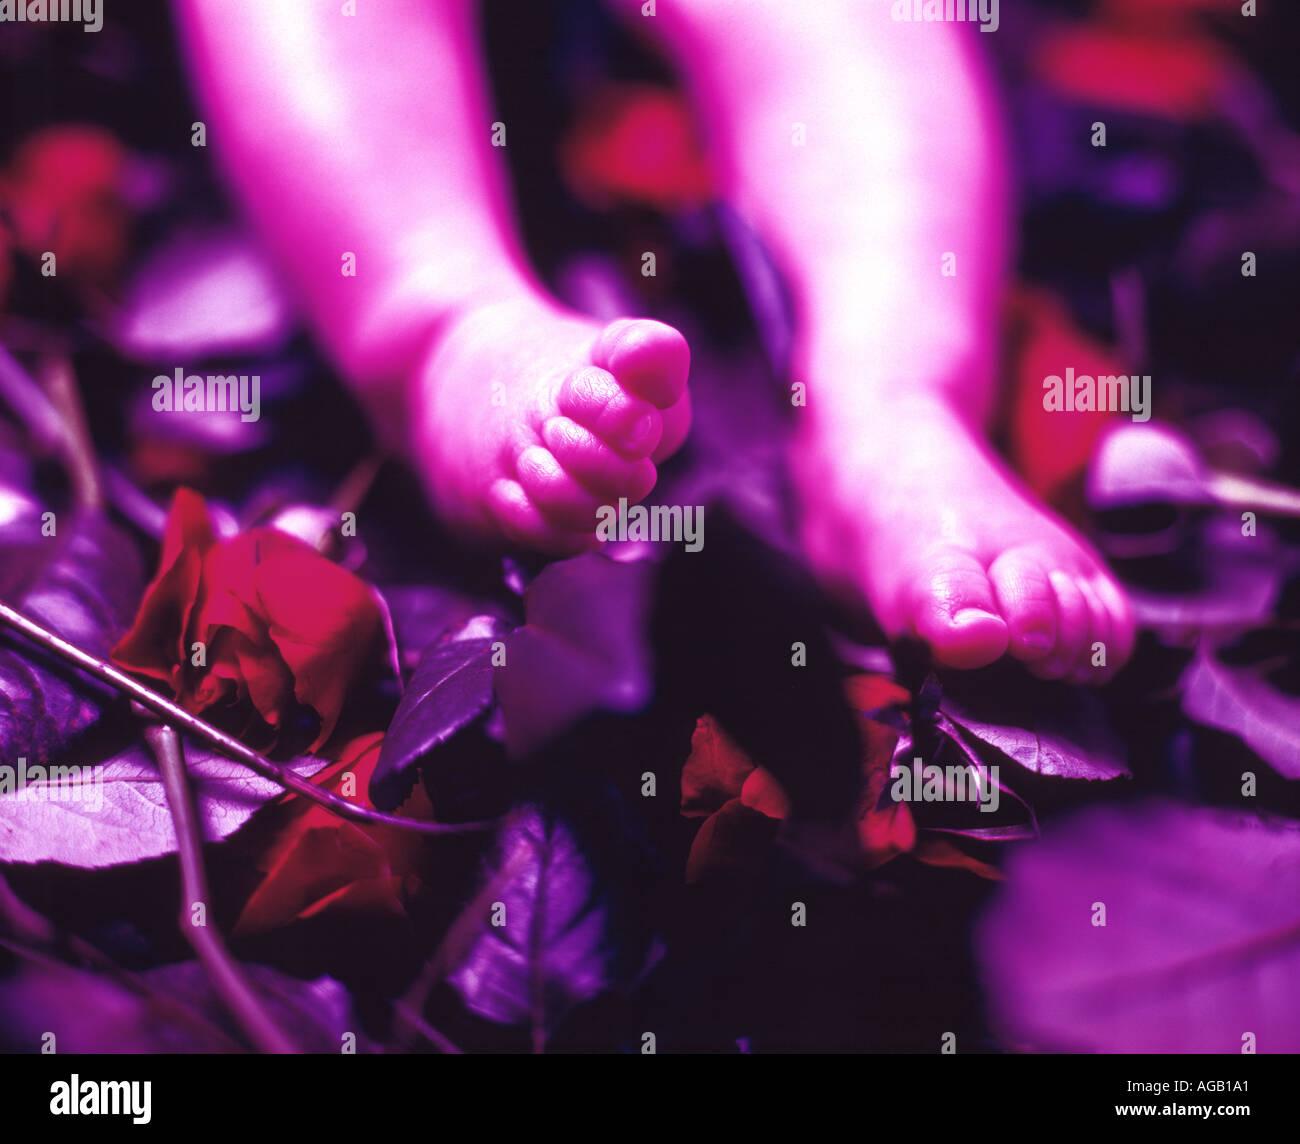 babies feet on rose buds - Stock Image